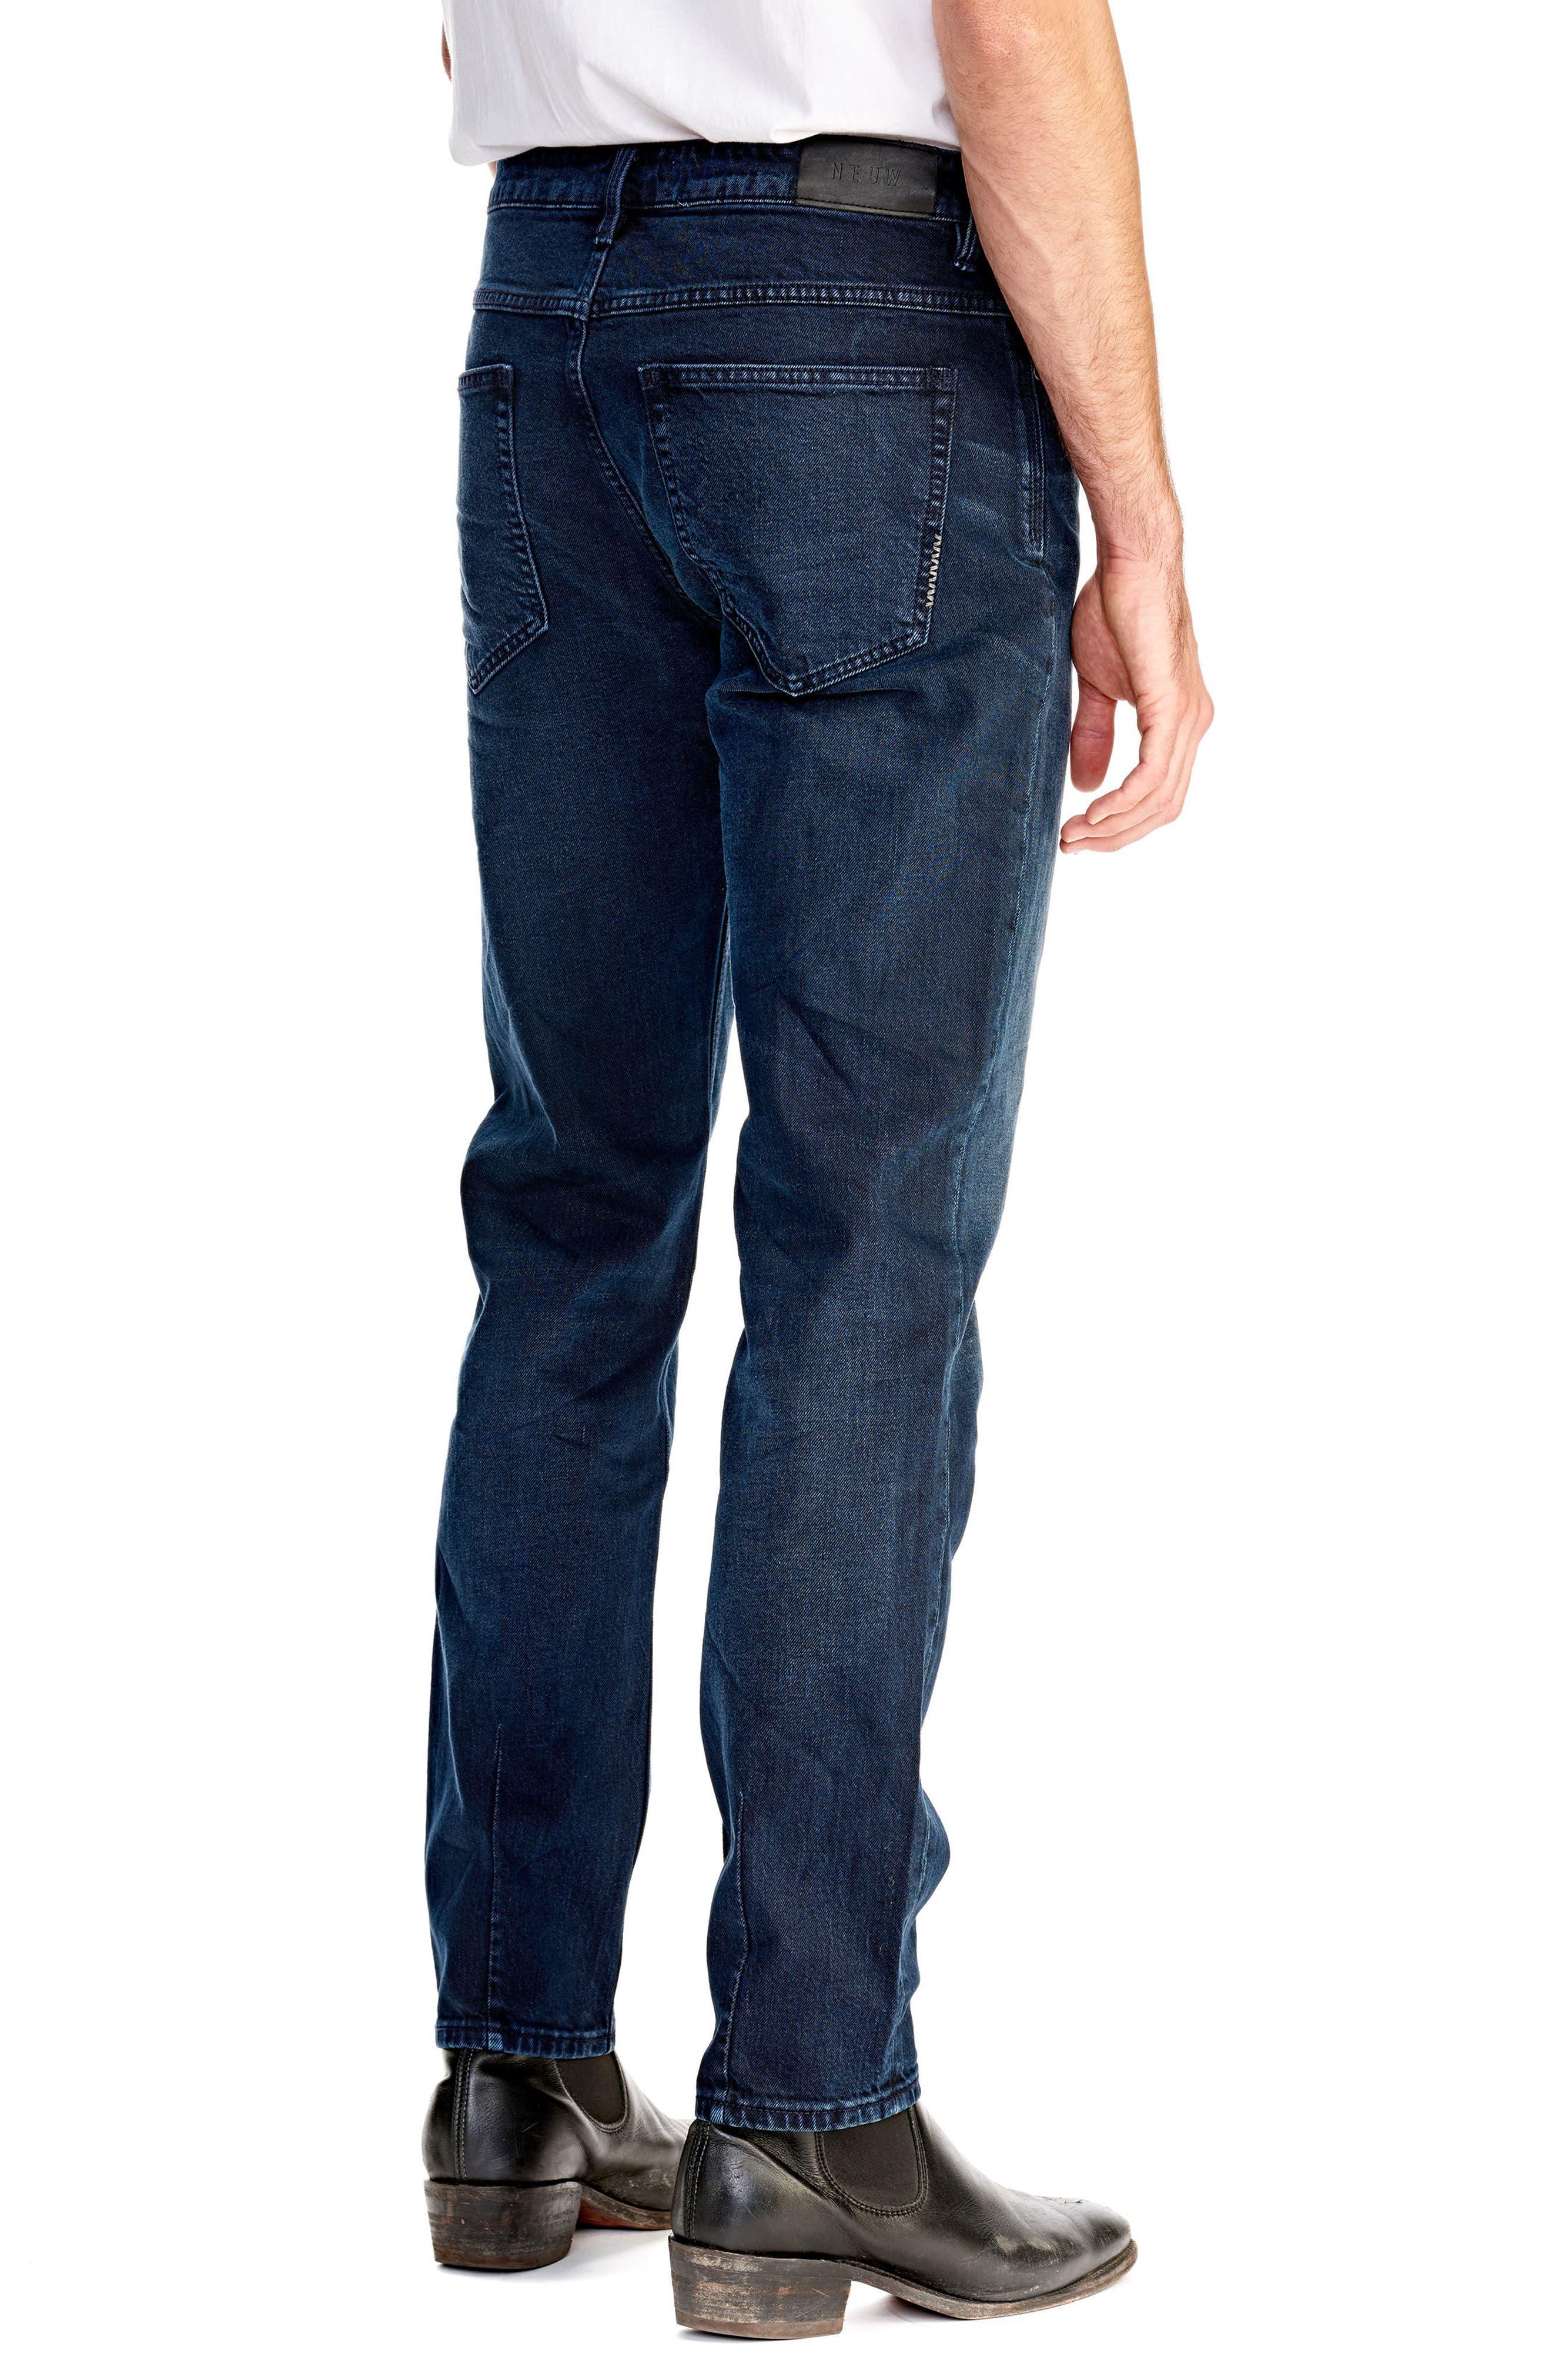 Lou Slim Fit Jeans,                             Alternate thumbnail 2, color,                             ZYDECO